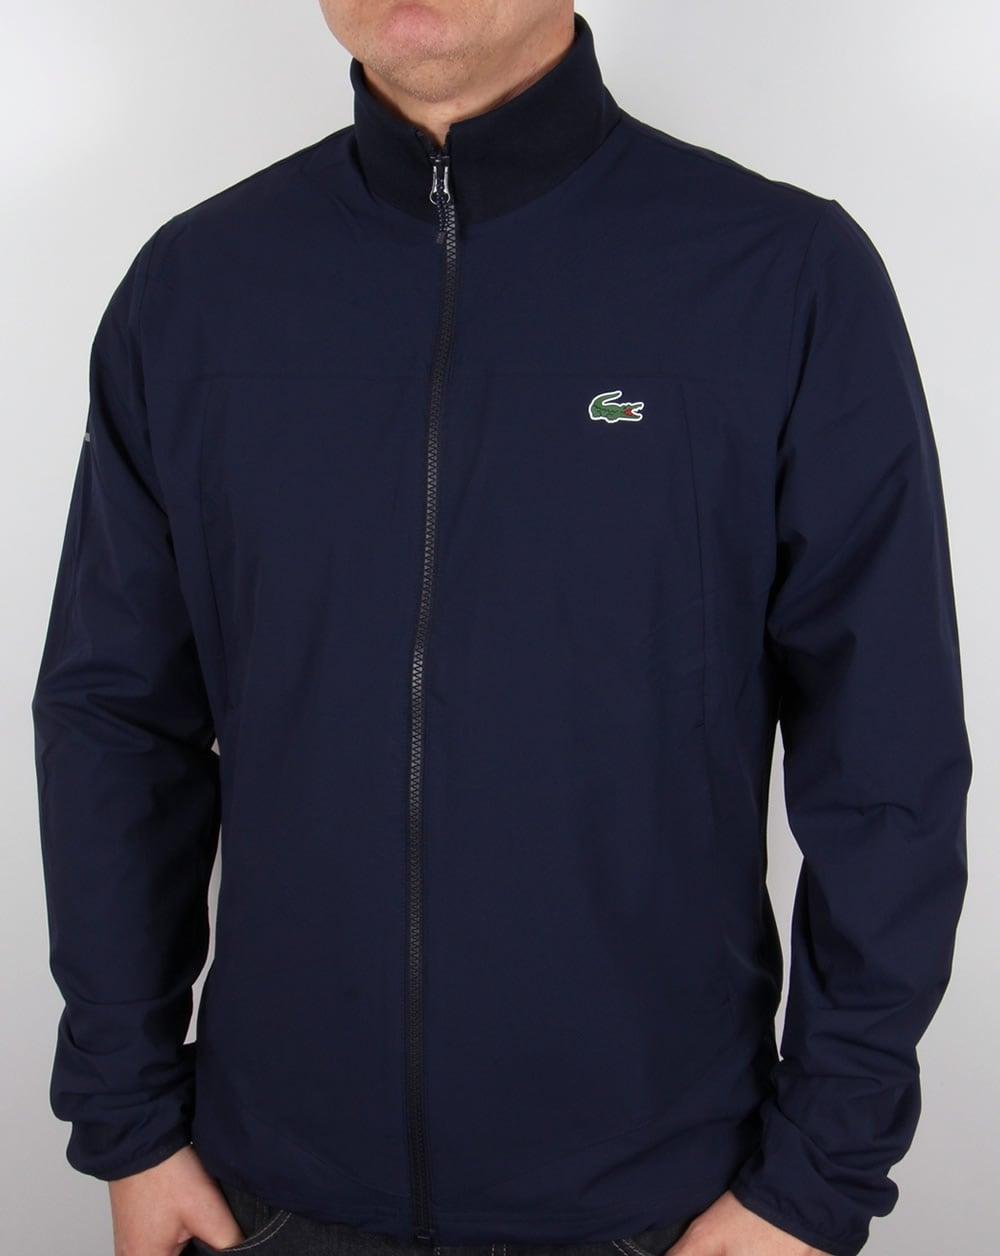 lacoste zipped jacket navy white coat harrington mens. Black Bedroom Furniture Sets. Home Design Ideas